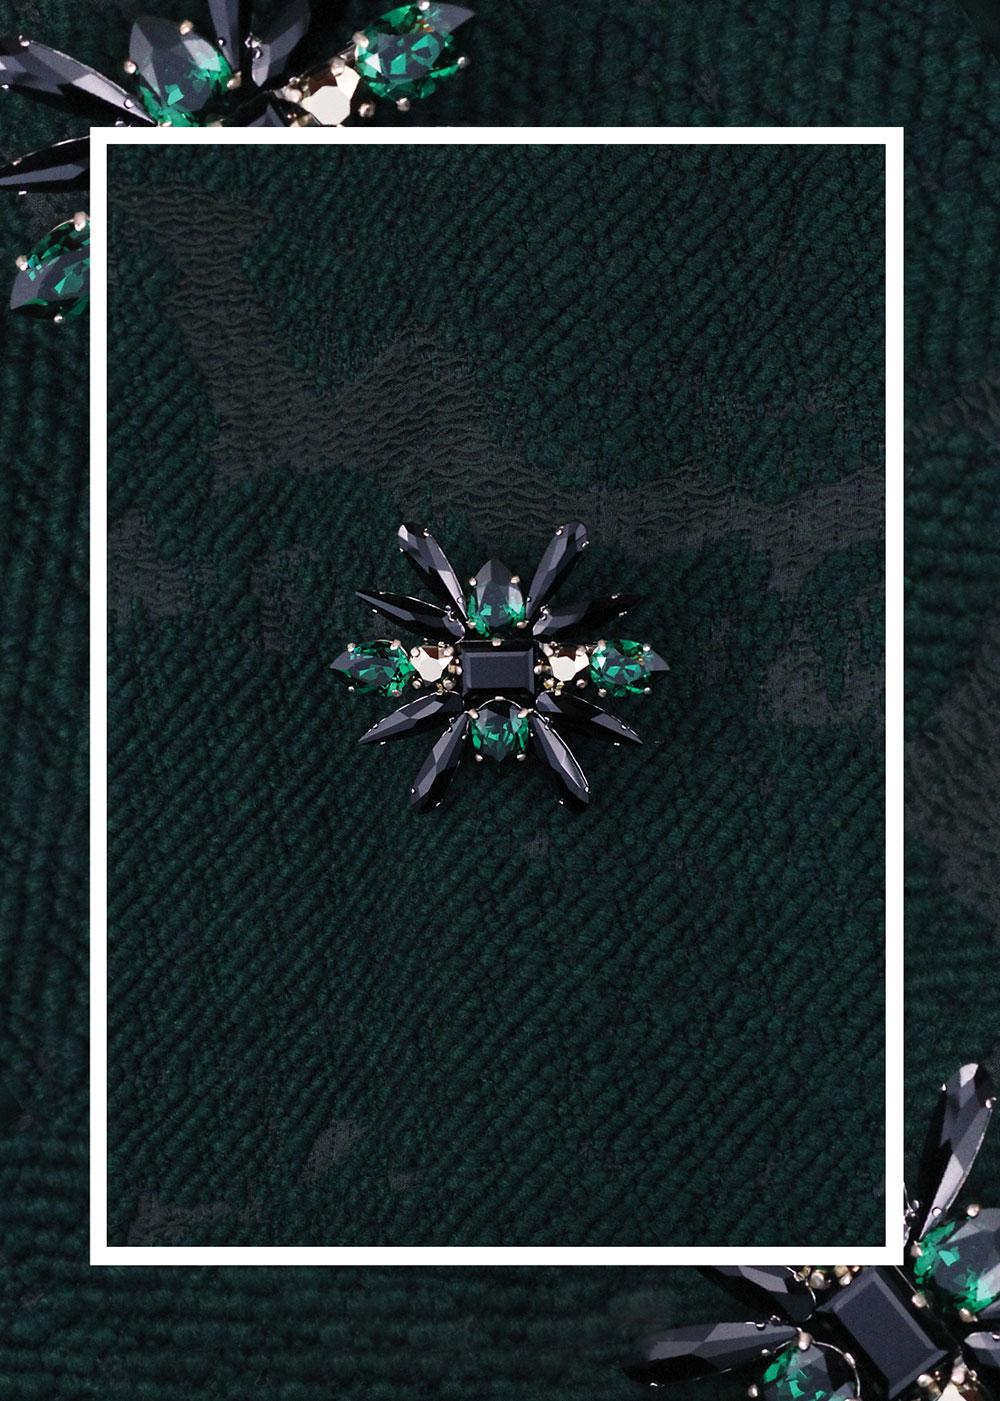 02_brosa_Josephine_cristale_swarovski_negru_verde_smarald_auriu_metalic-greige